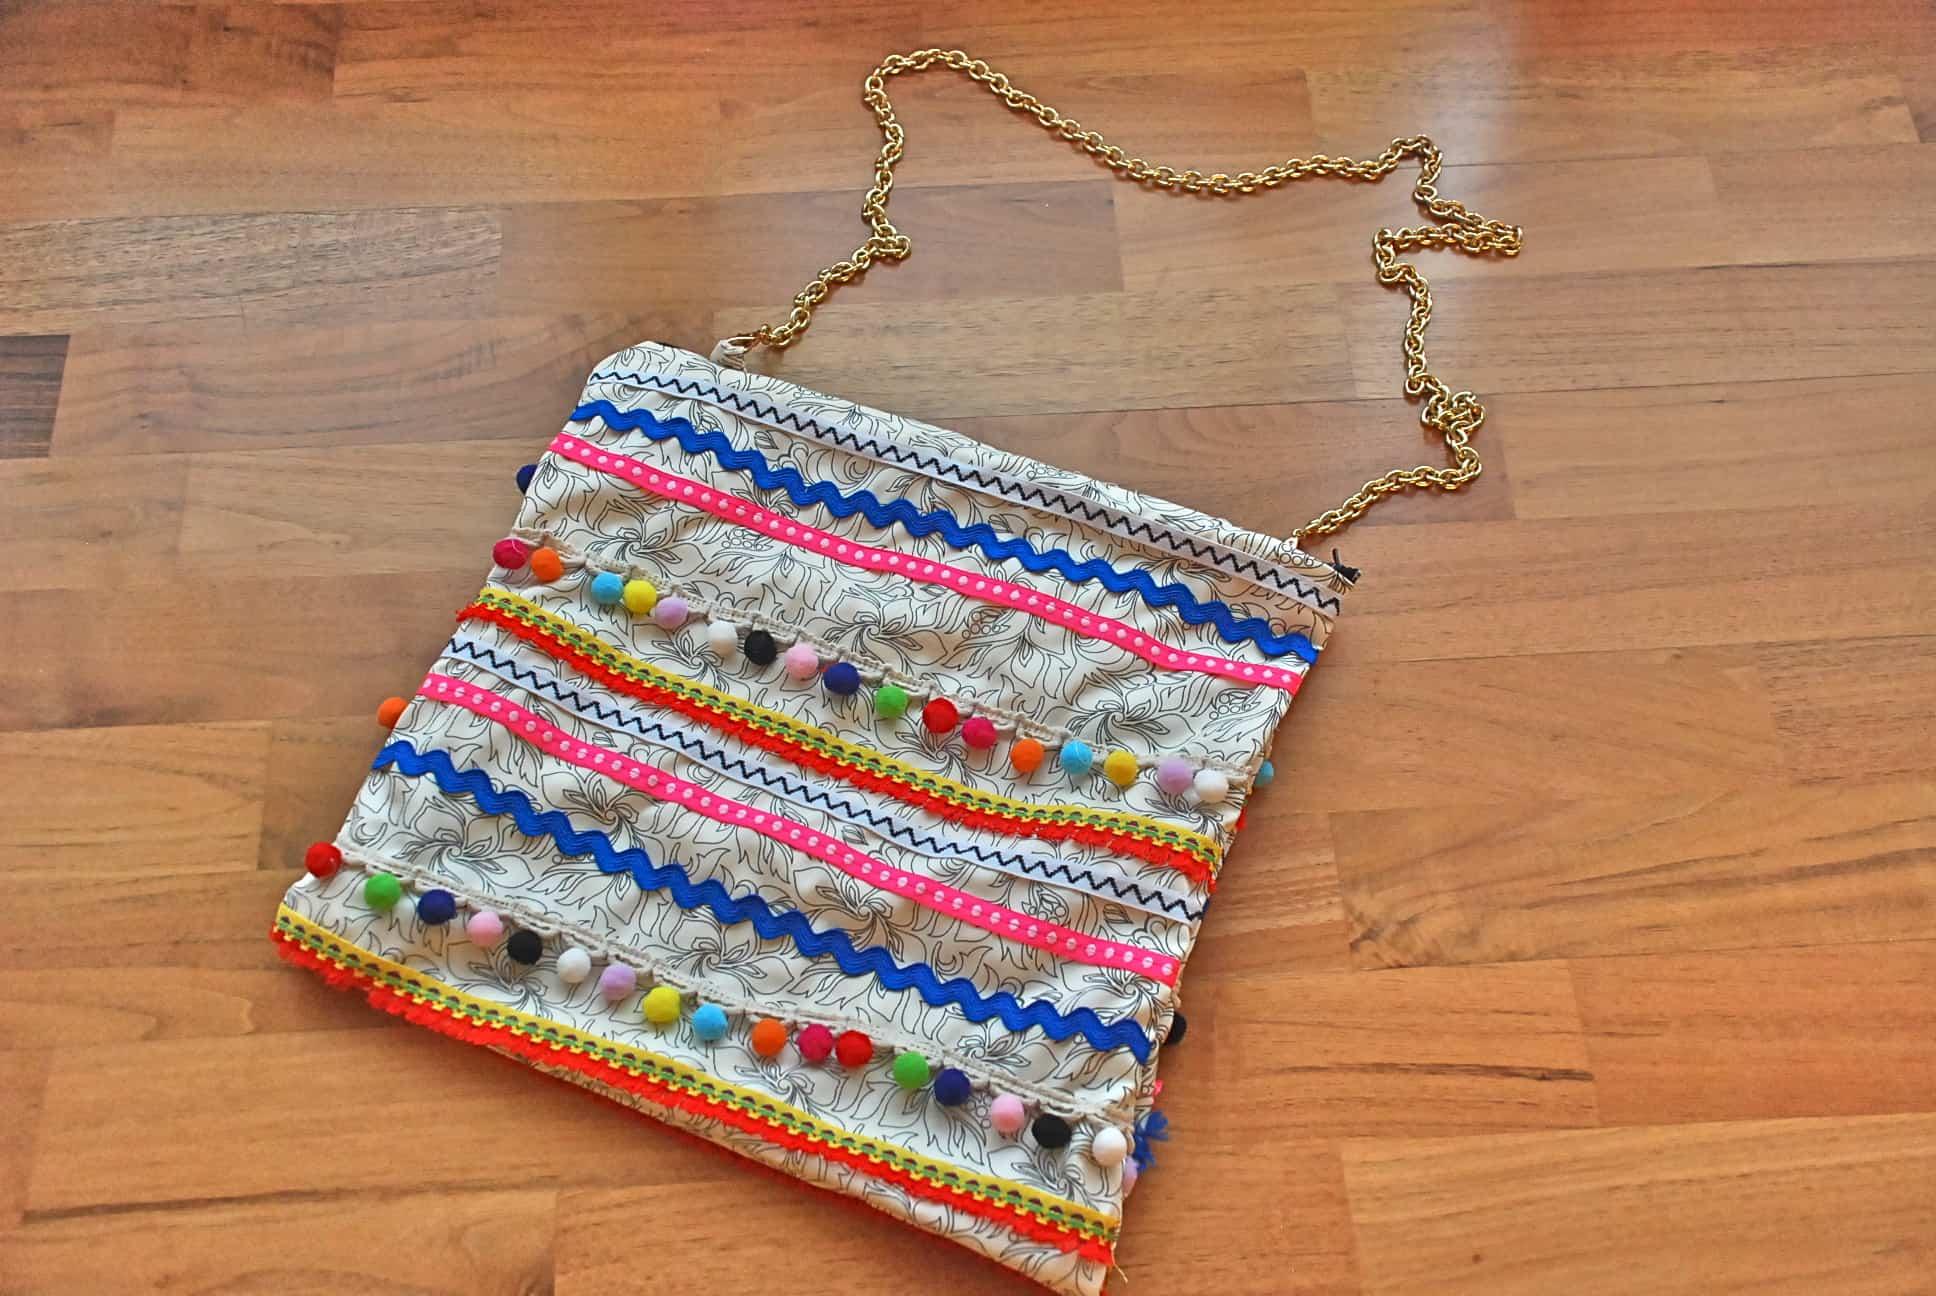 Colorful ribbons boho purse